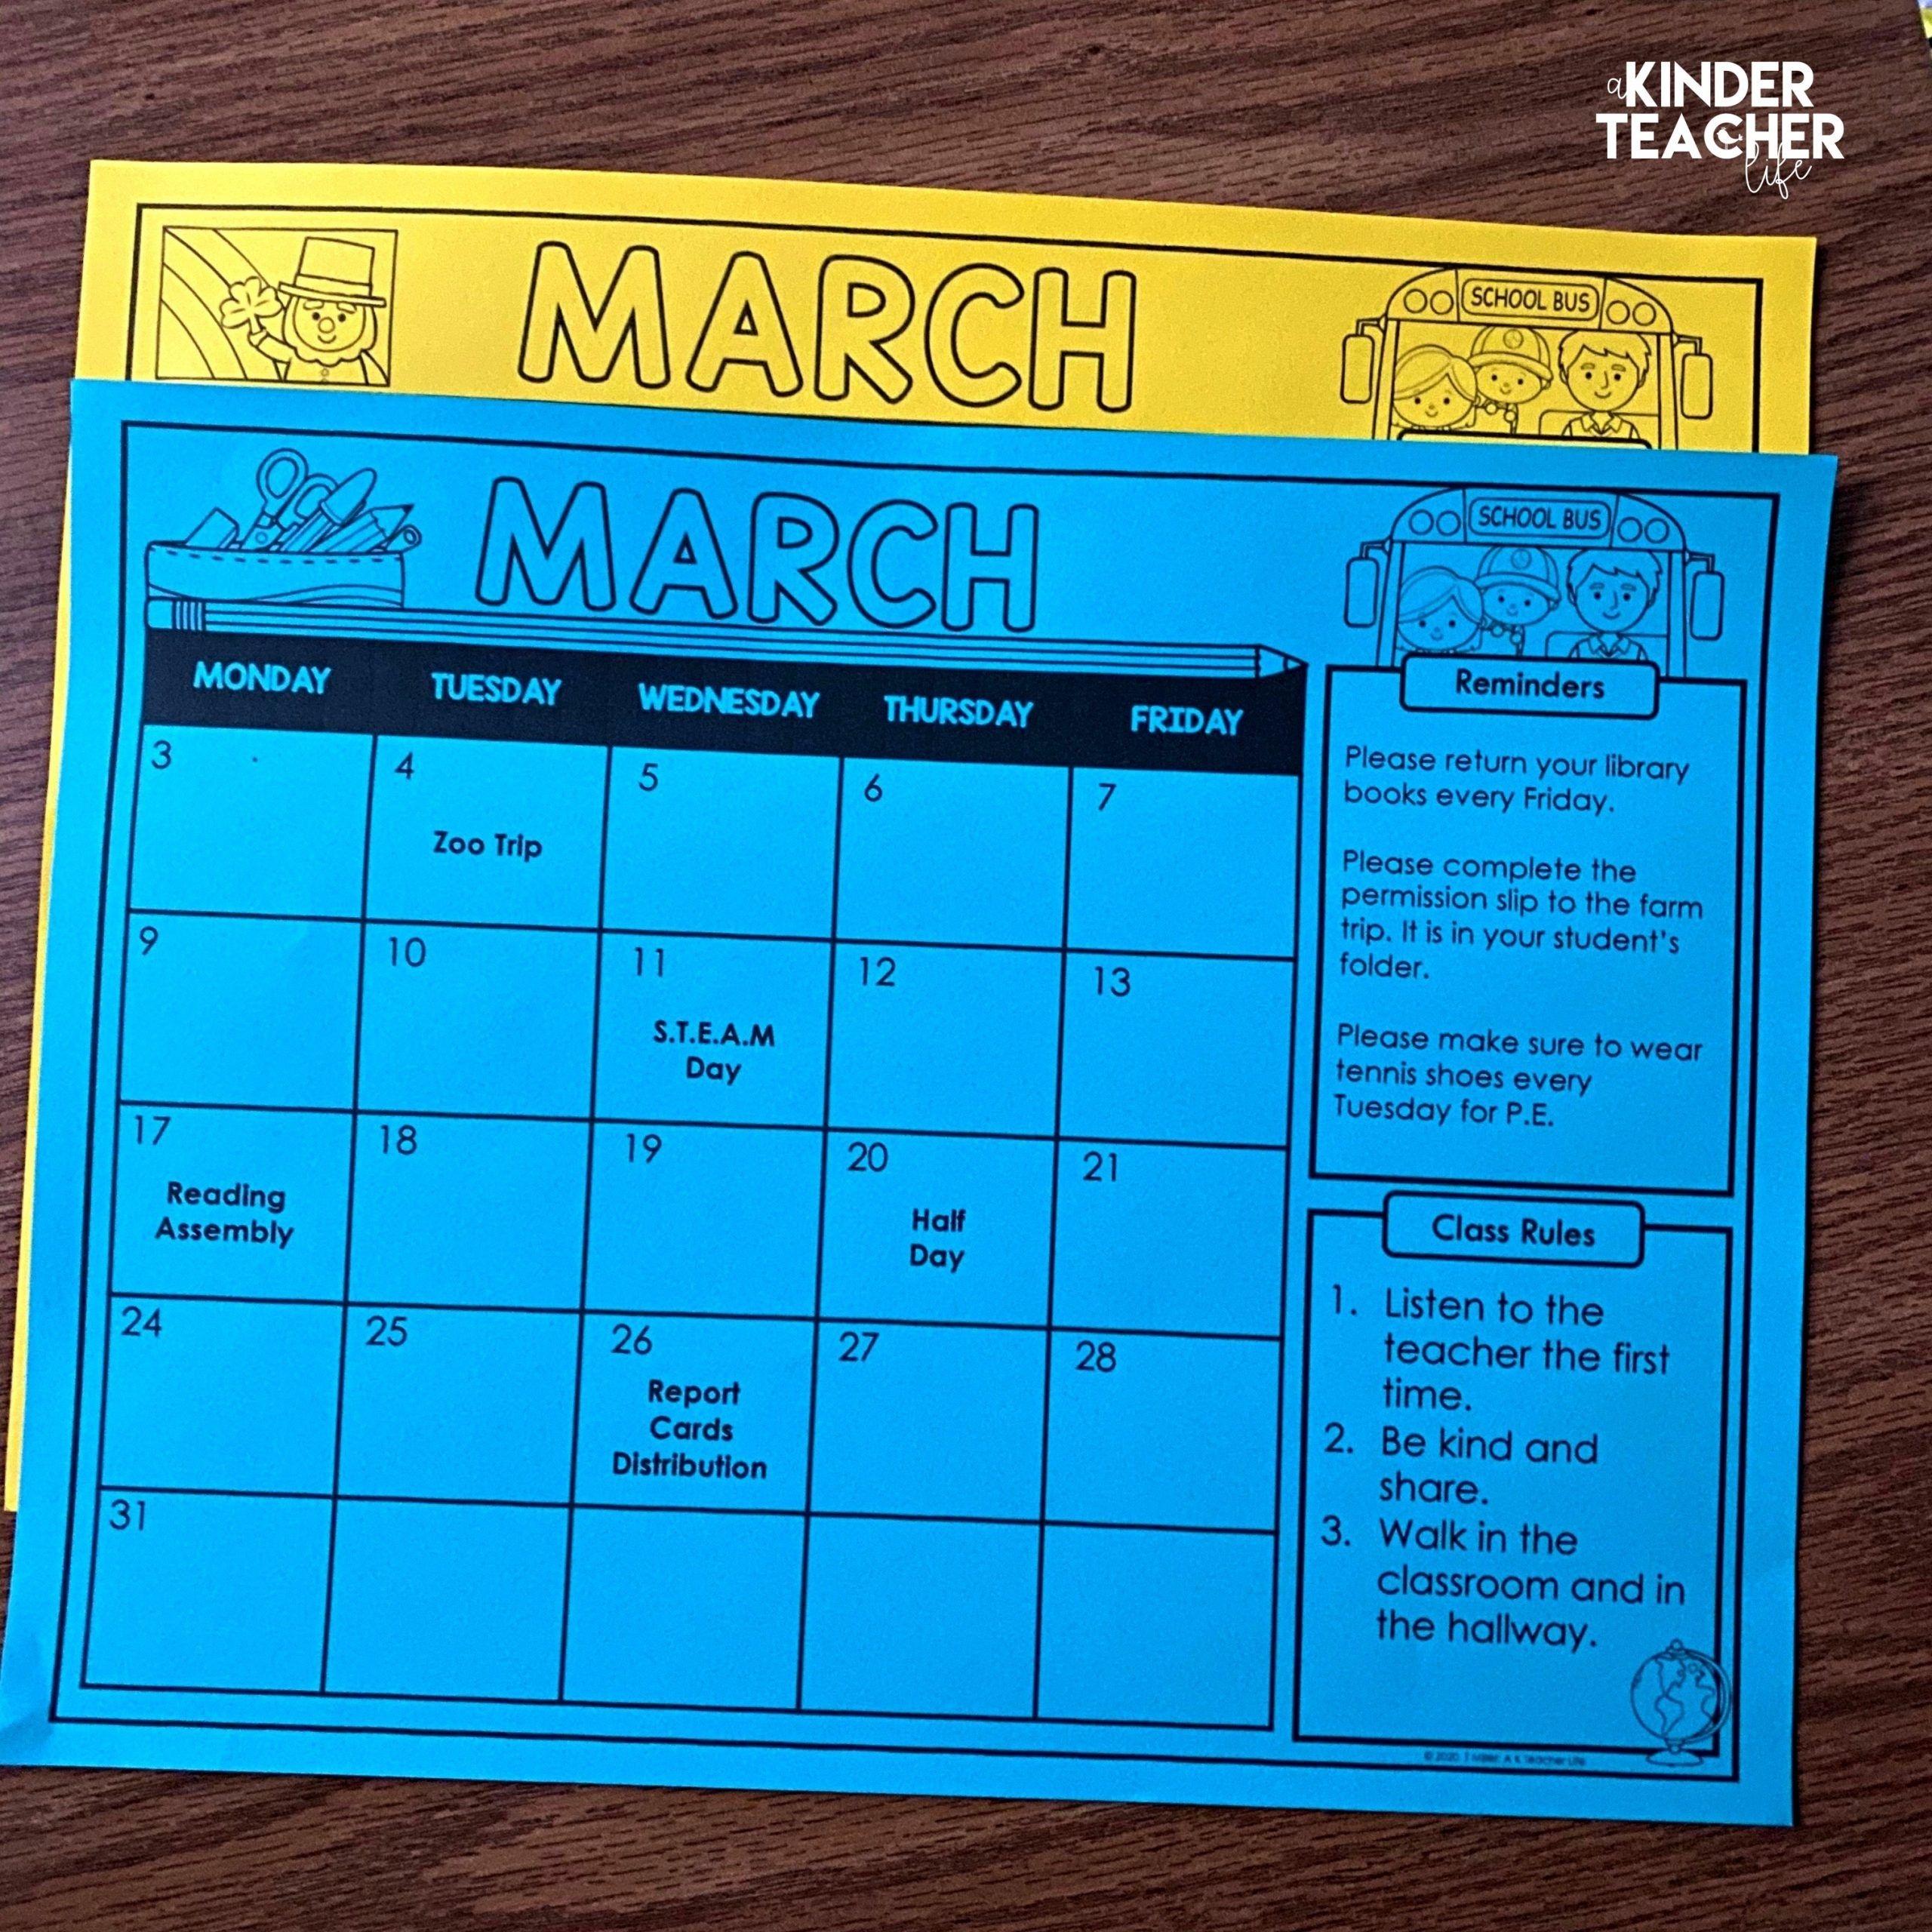 Free Editable Monthly Class Calendars - A Kinderteacher Life